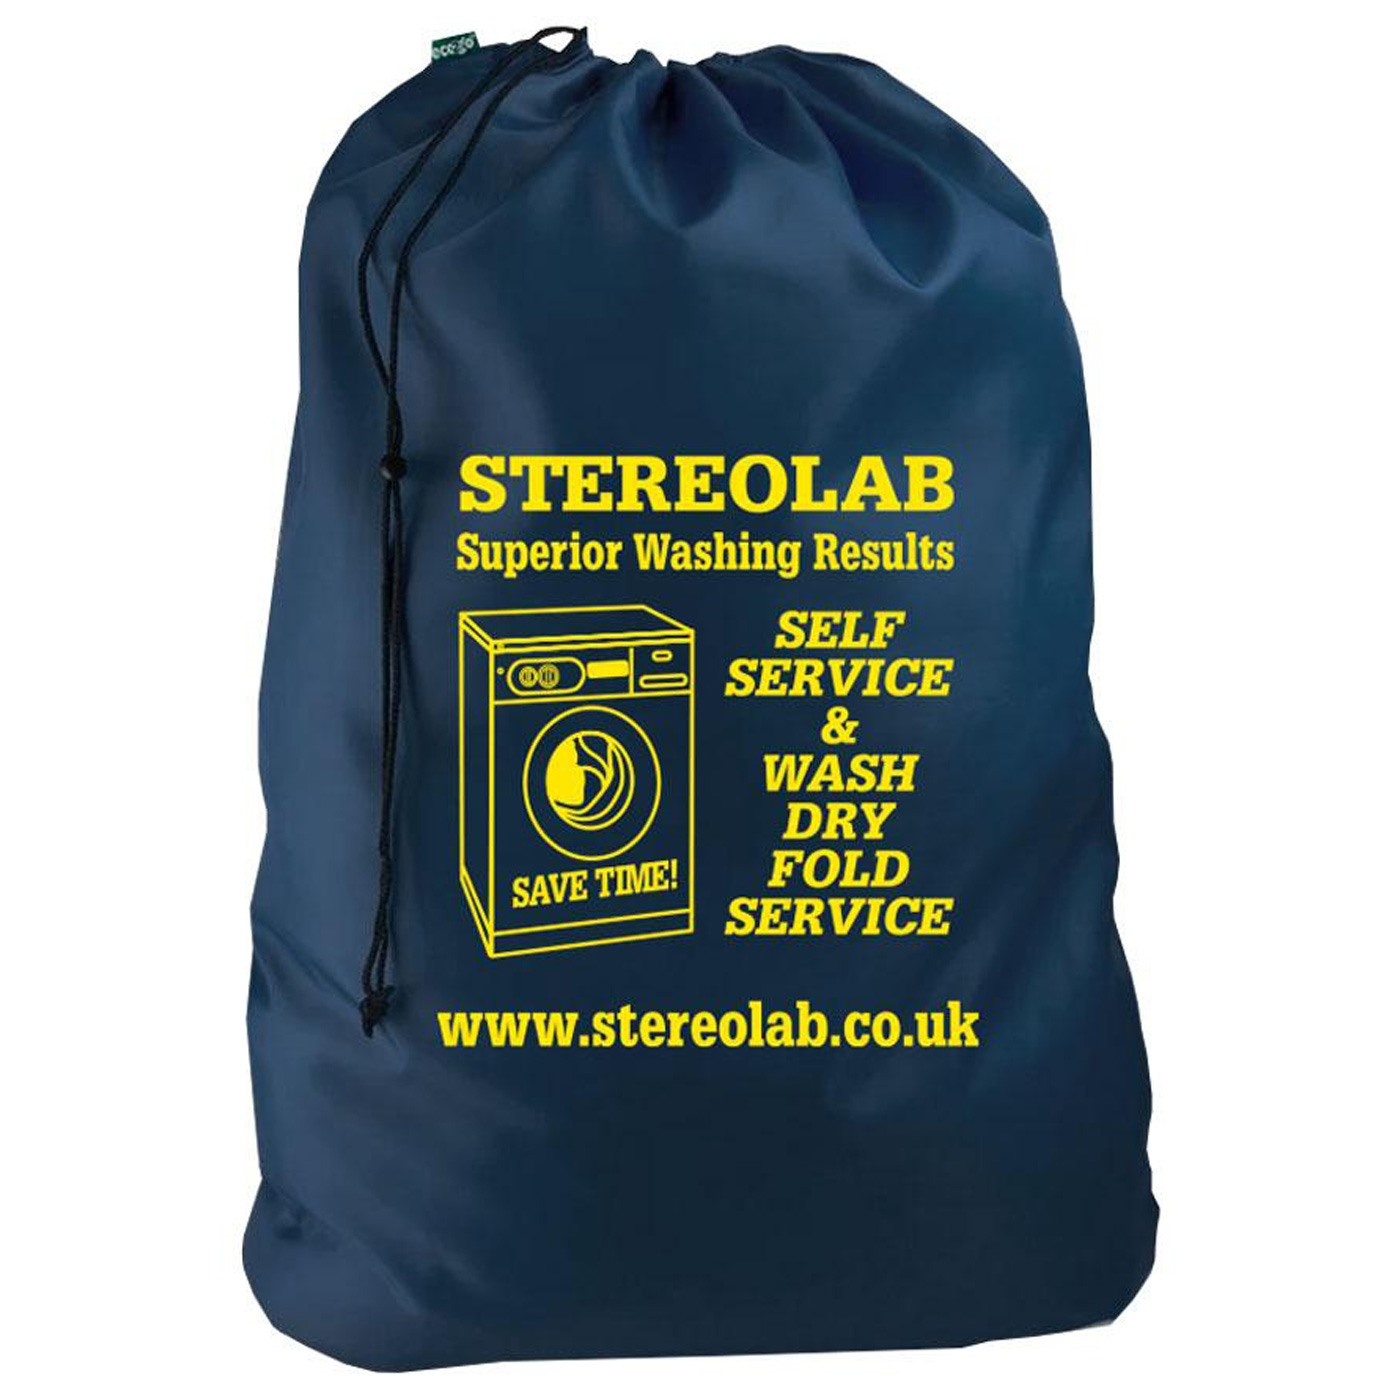 STEREOLAB ランドリーバッグ Laundry Bag